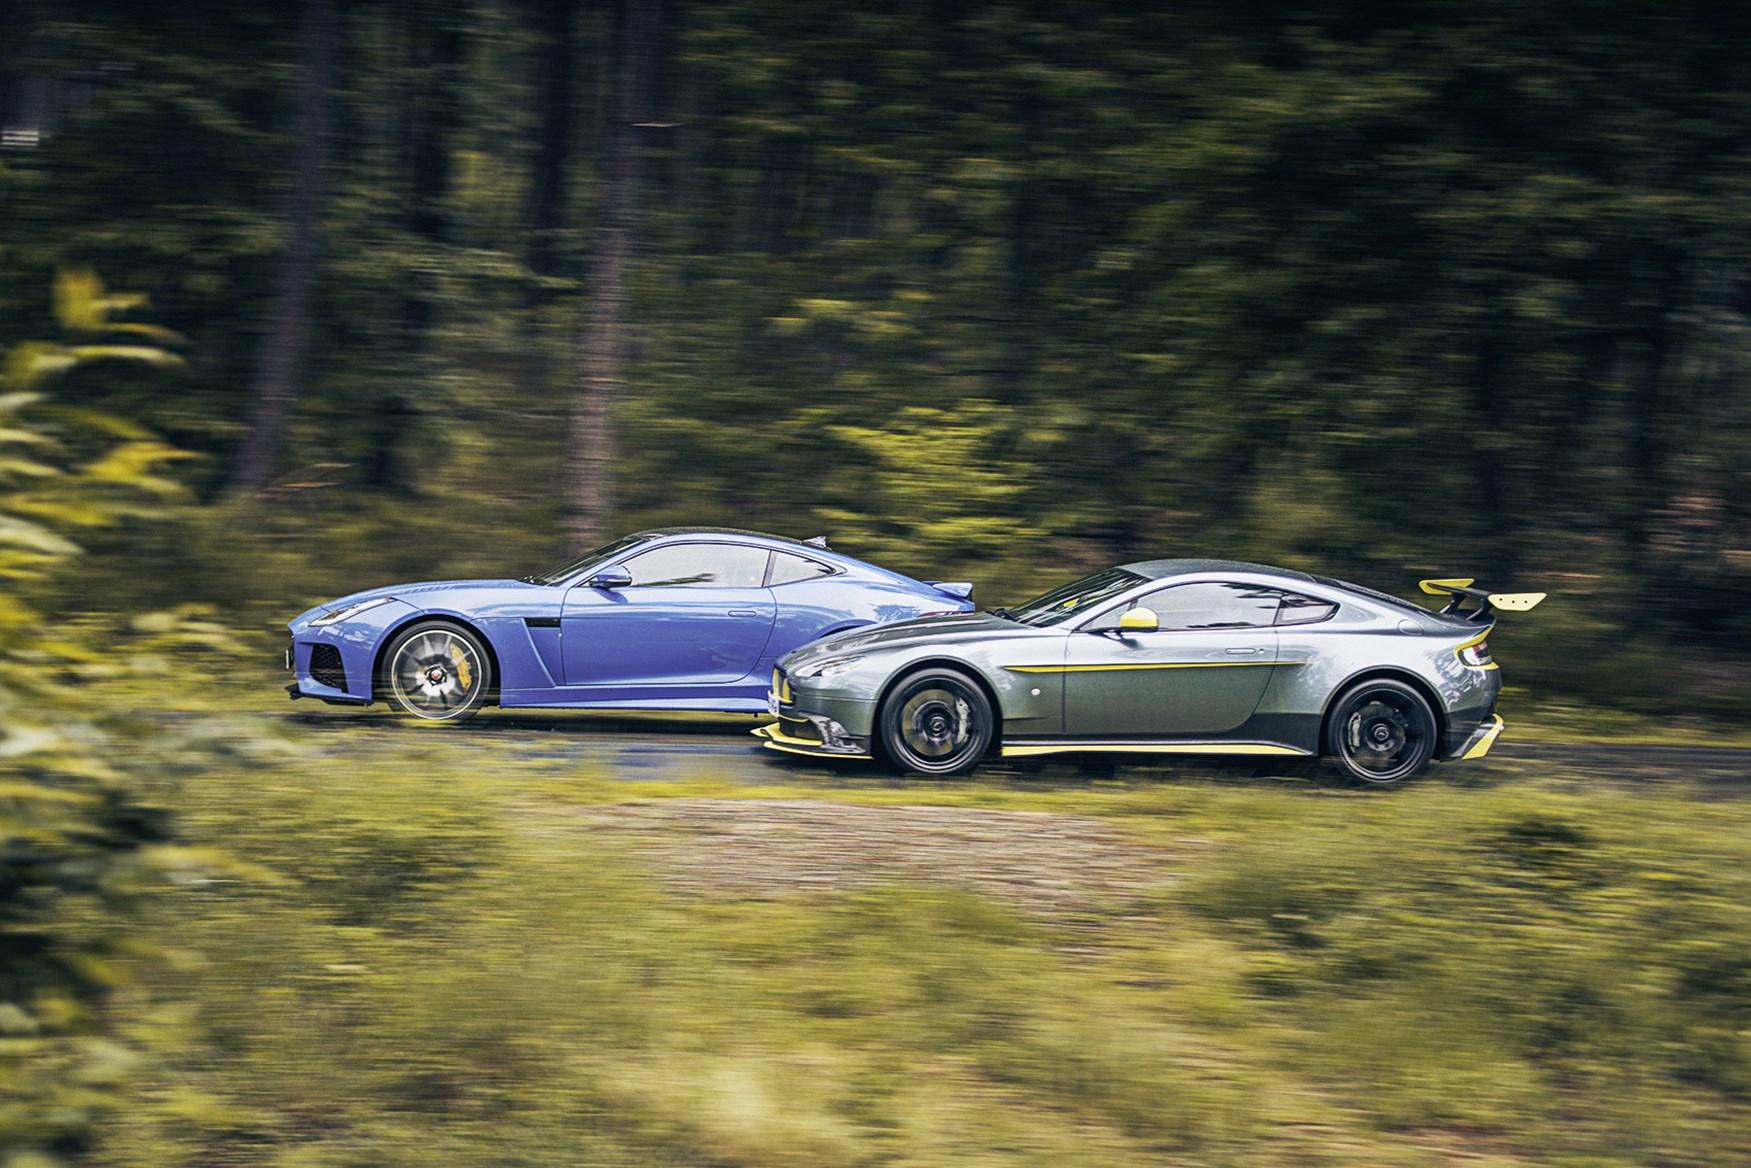 aston martin vantage gt8 vs jaguar f-type svr twin test review (2016